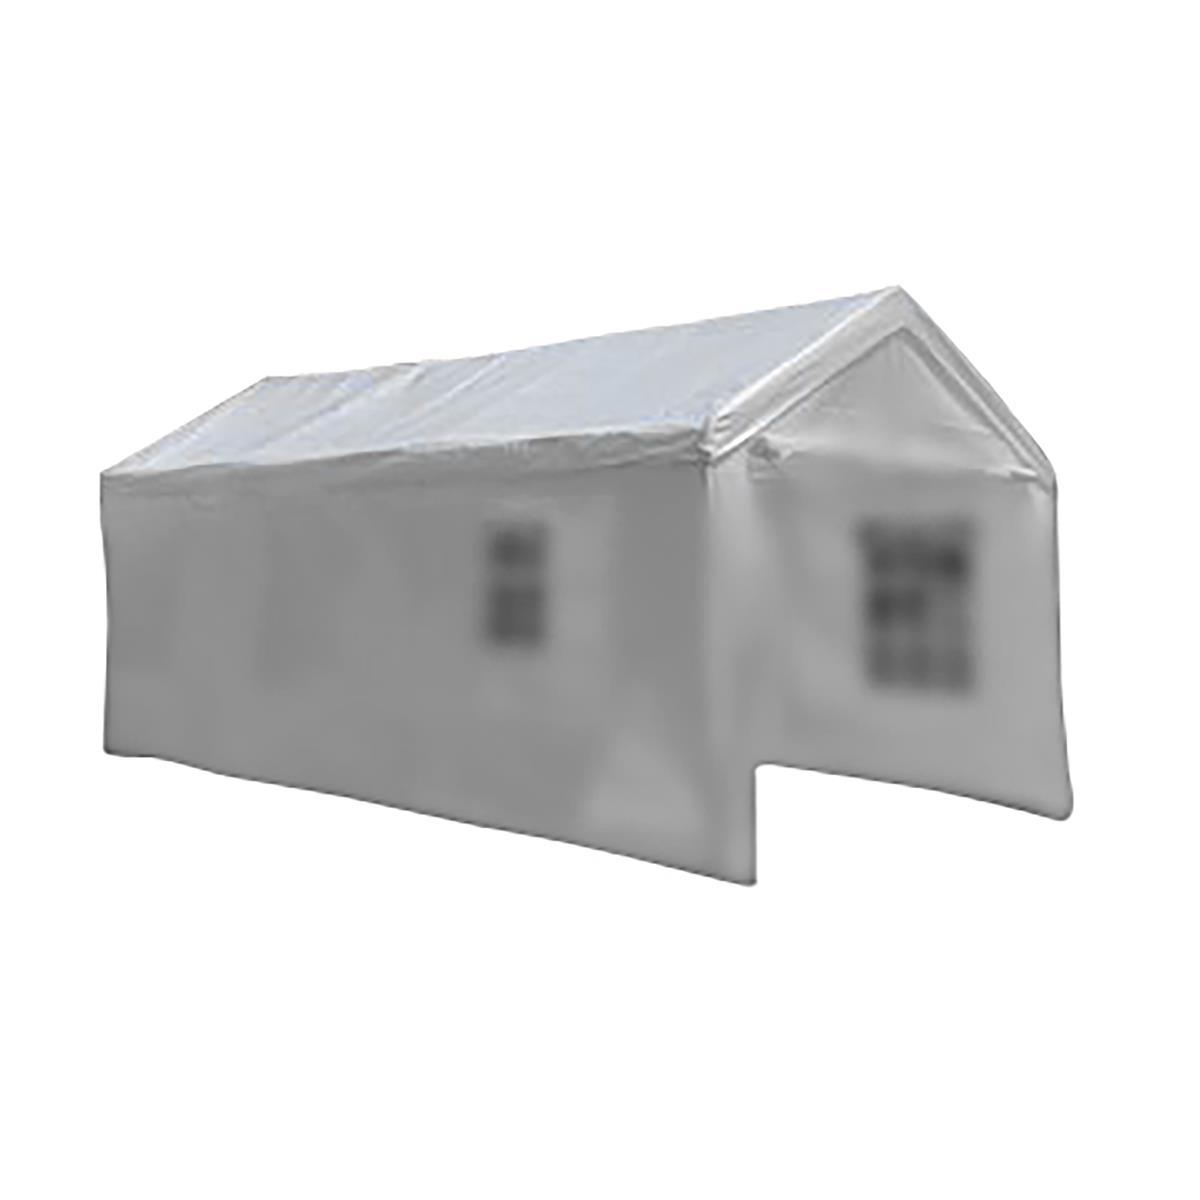 Ersatzdach Dachplane für Partyzelt Pavillon Zelt Festzelt PE 4 x 8m weiß